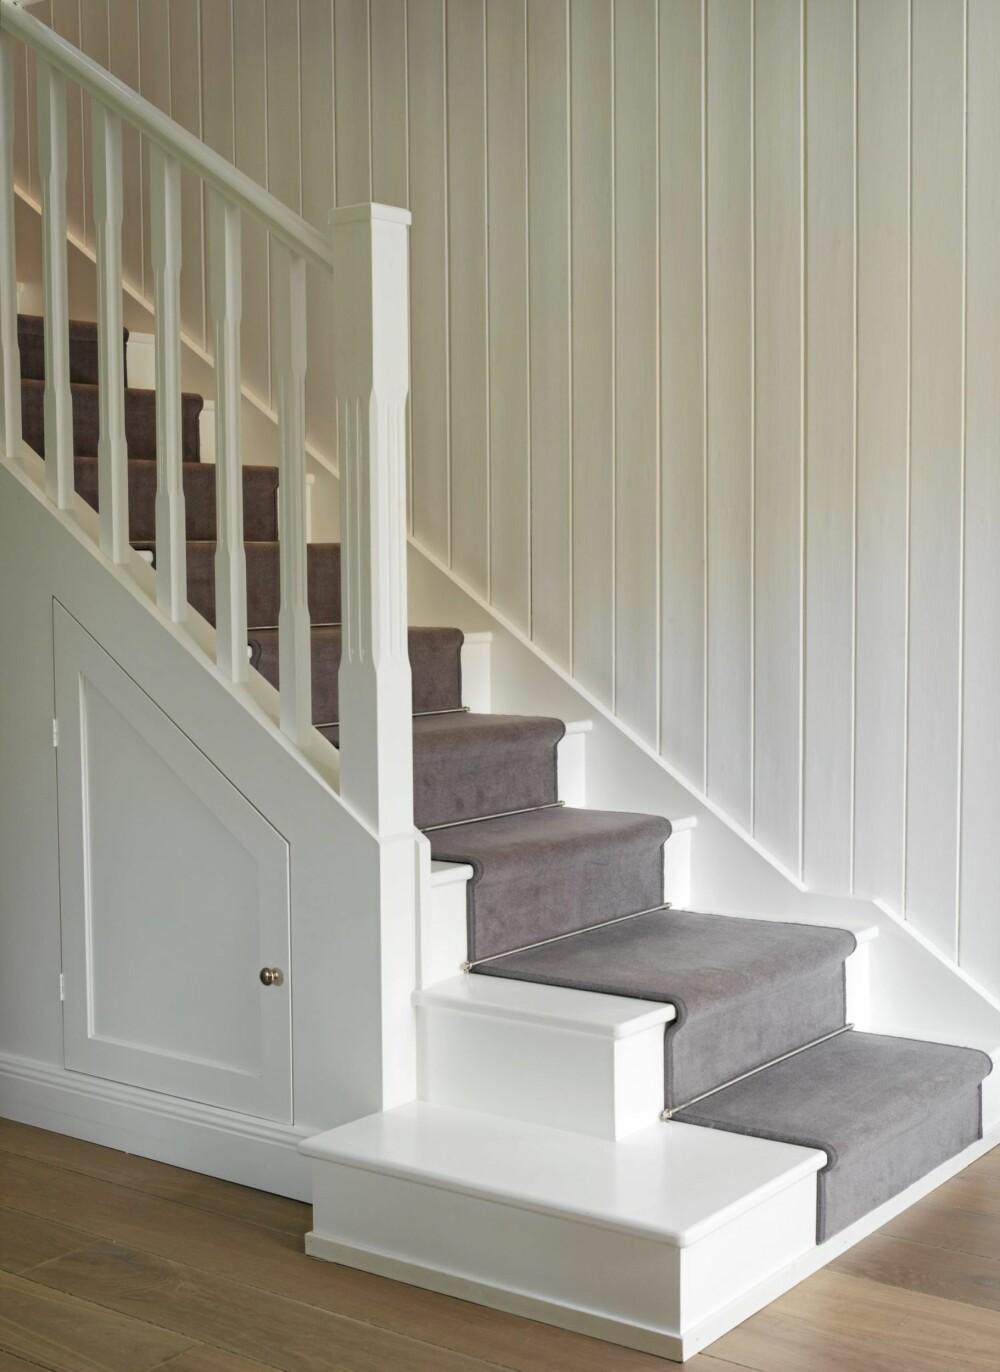 SKJULT OPPBEVARING UNDER TRAPPEN: Rommet under den klassiske trappen er utnyttet til oppbevaring.